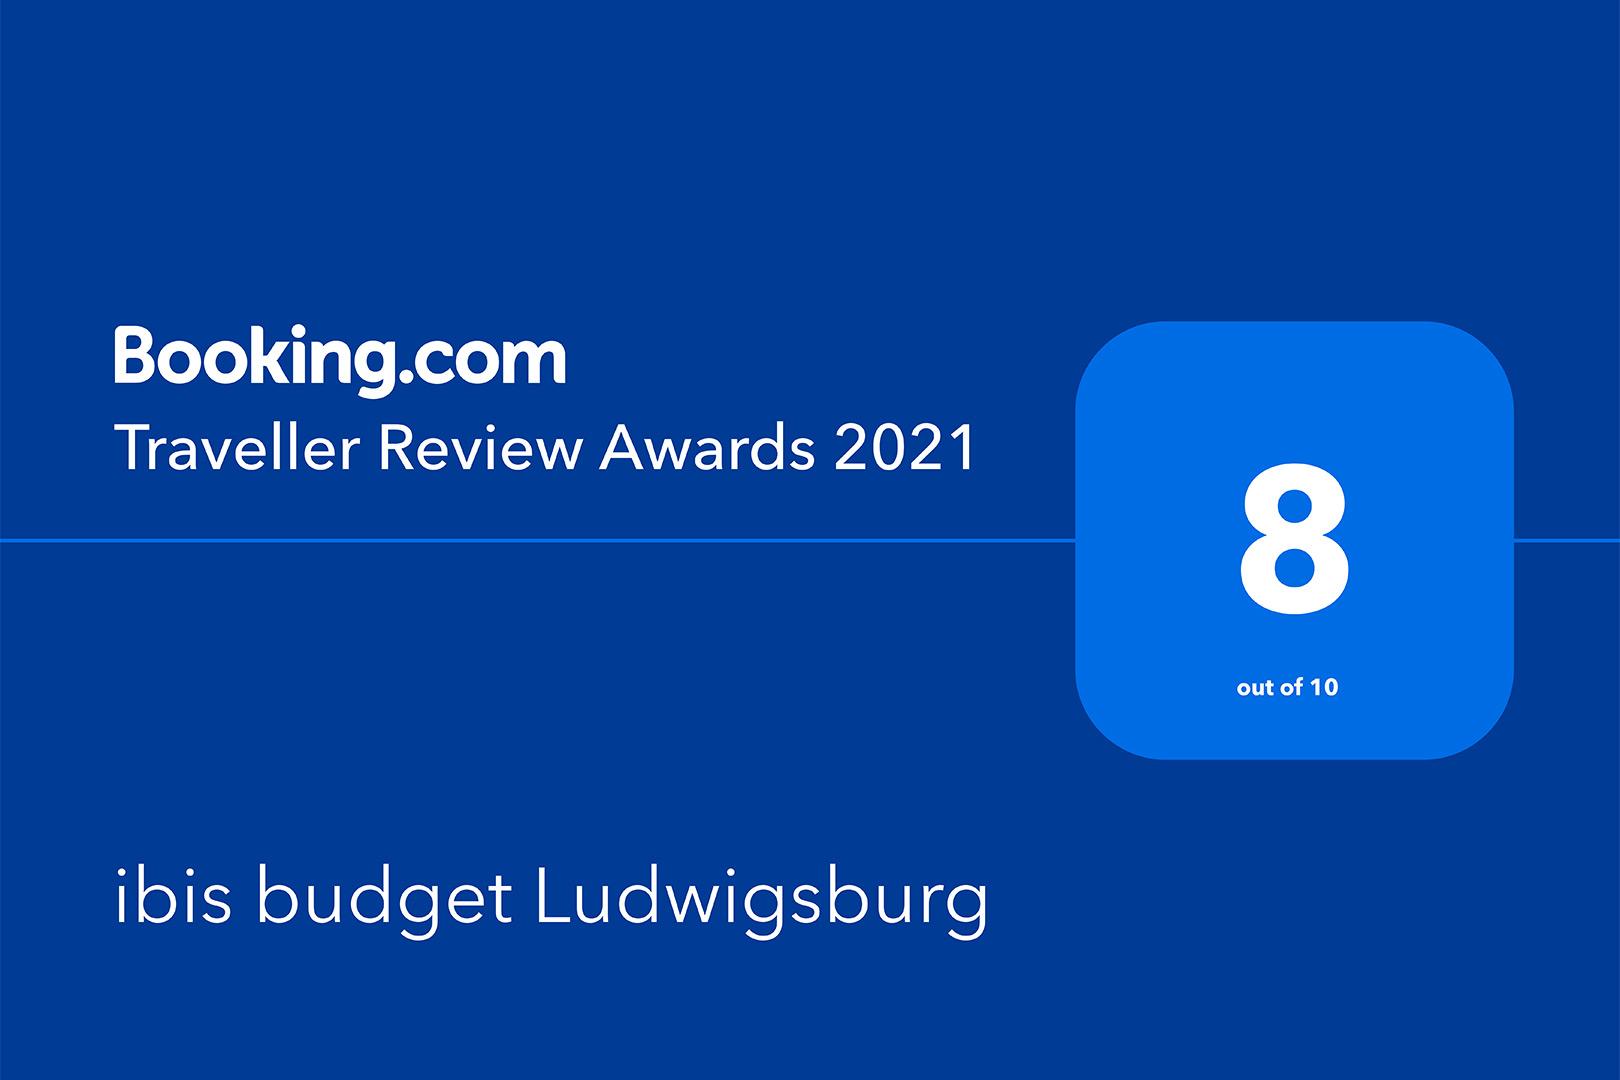 ibis budget Ludwigsburg - Traveller Review Award 2021